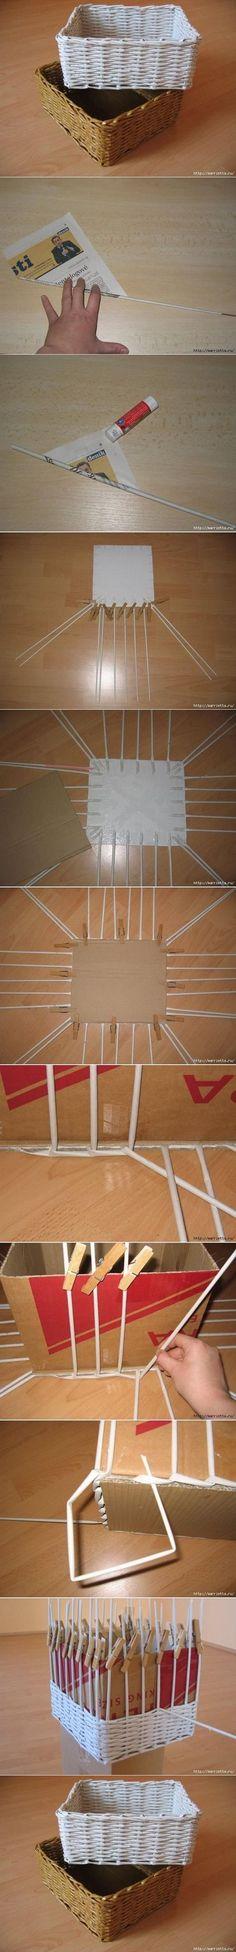 DIY Recycled Paper Basket: